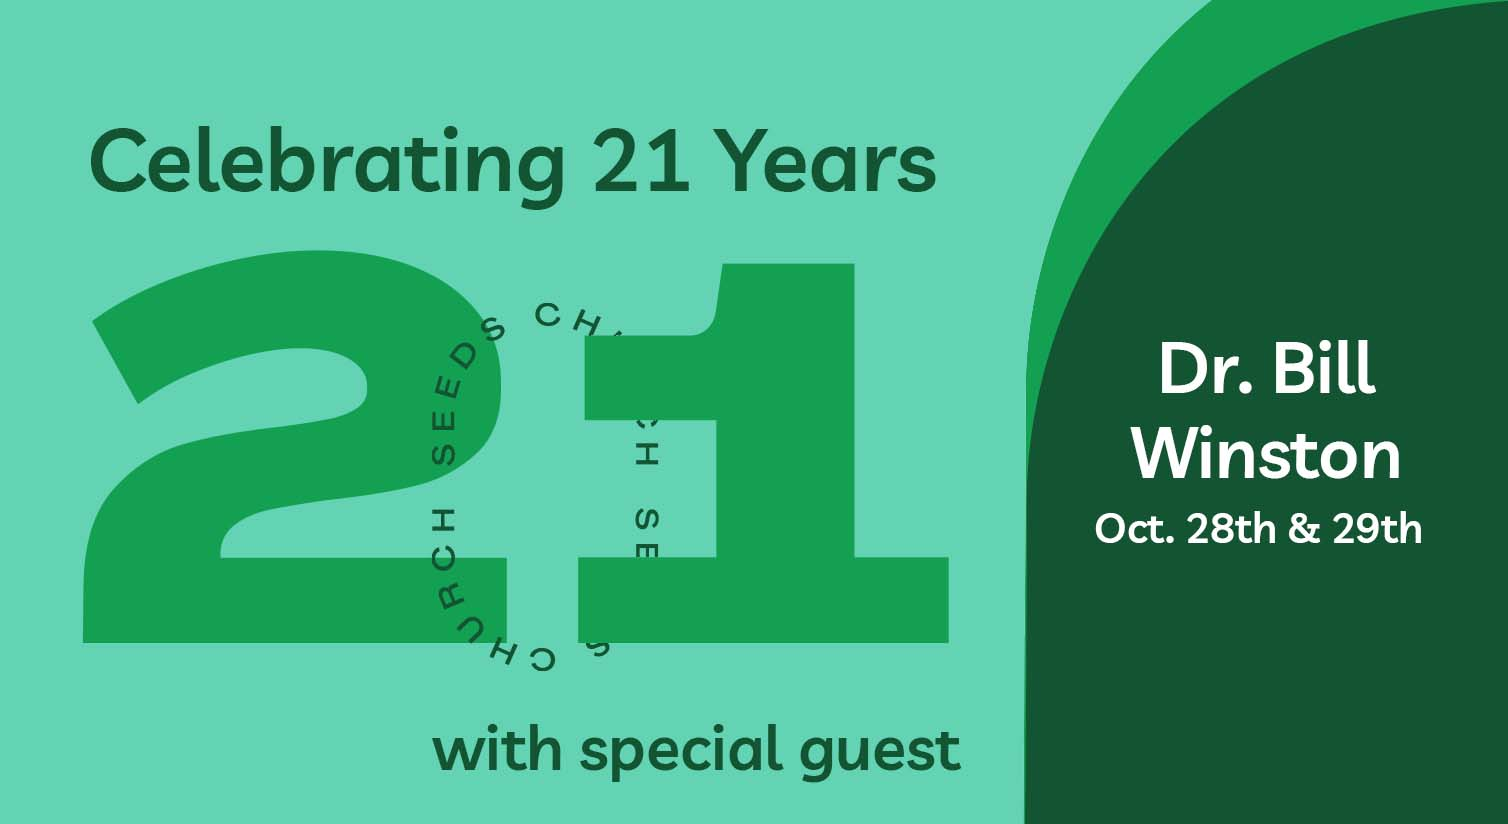 Guest Speaker: Dr. Bill Winston